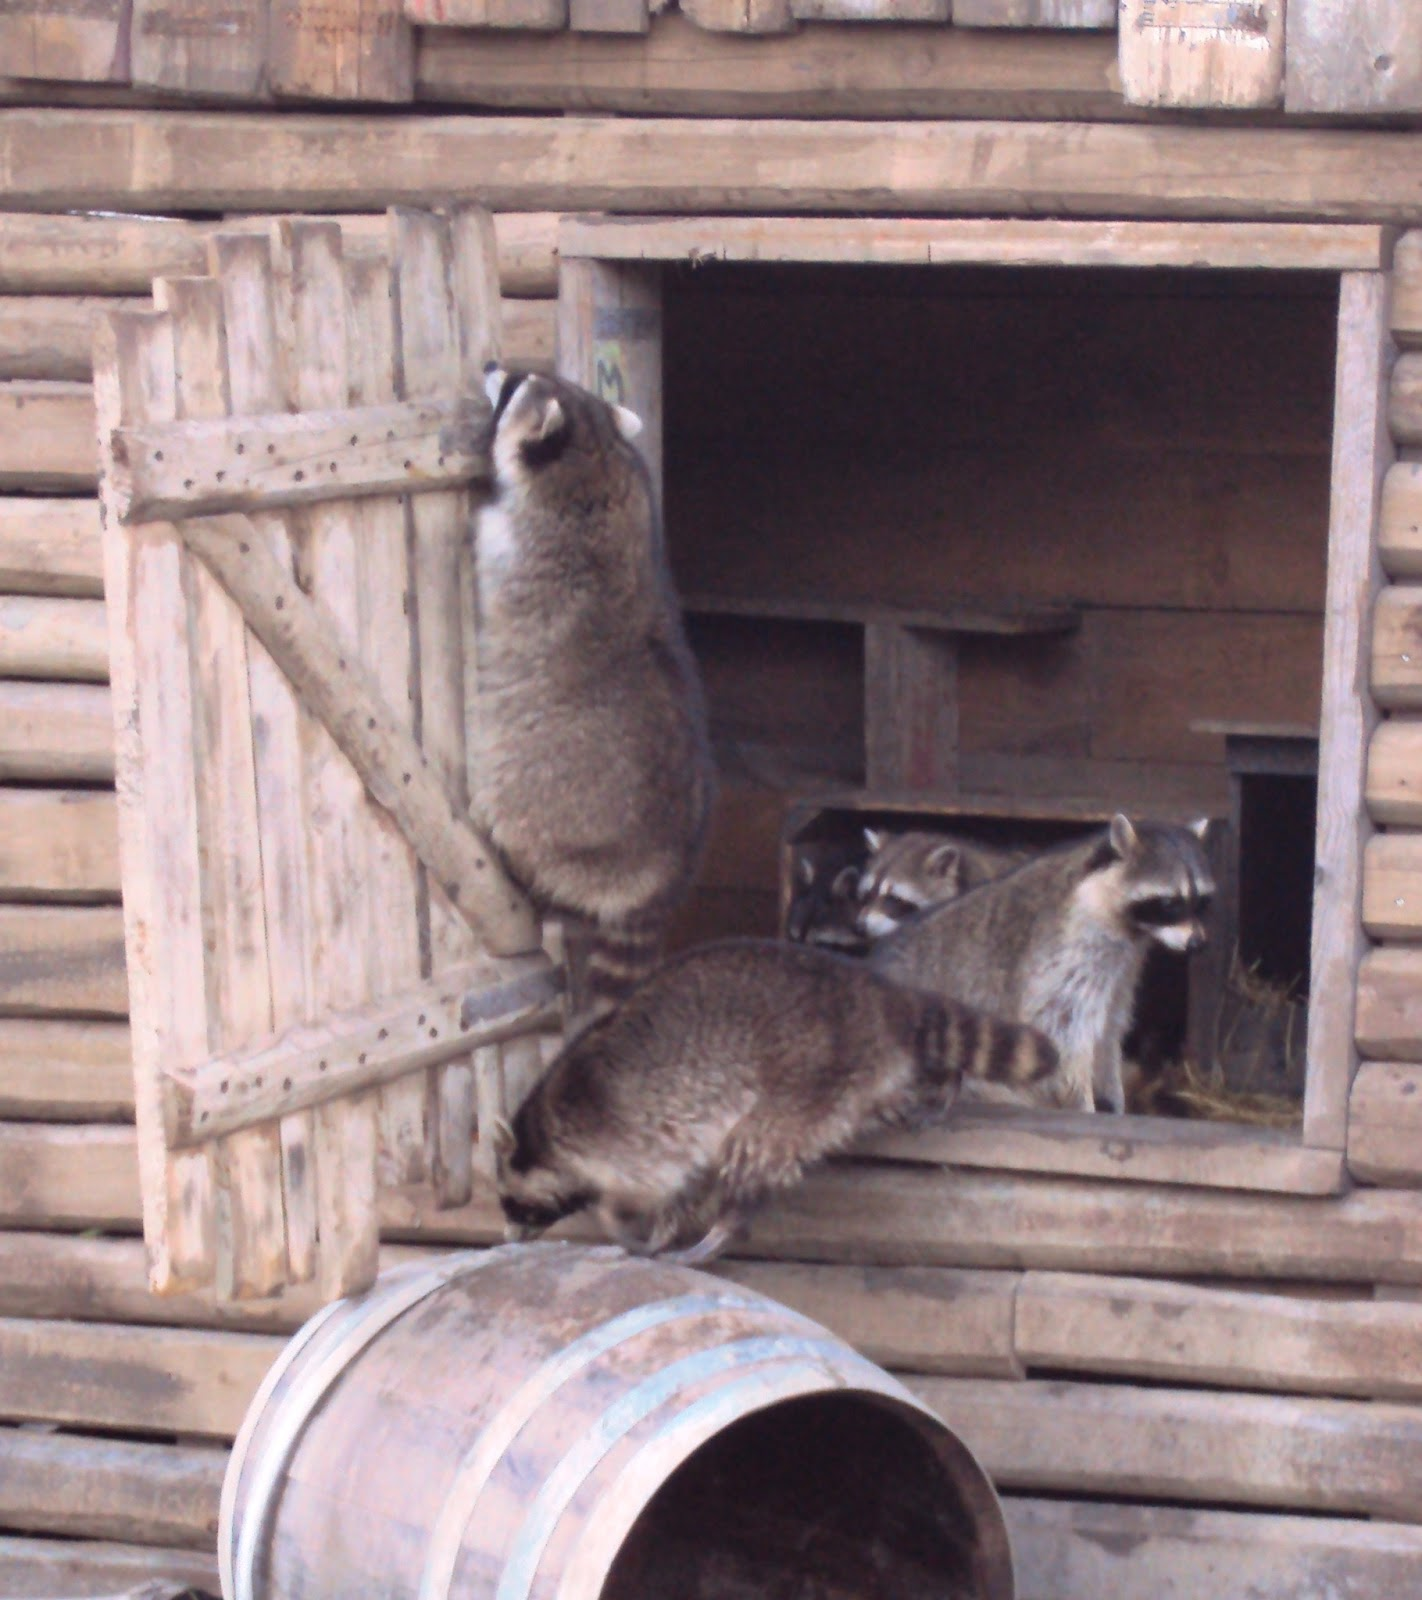 Angela Kuckartz Raccoons From Rotterdam Zoo Diergaarde Blijdorp